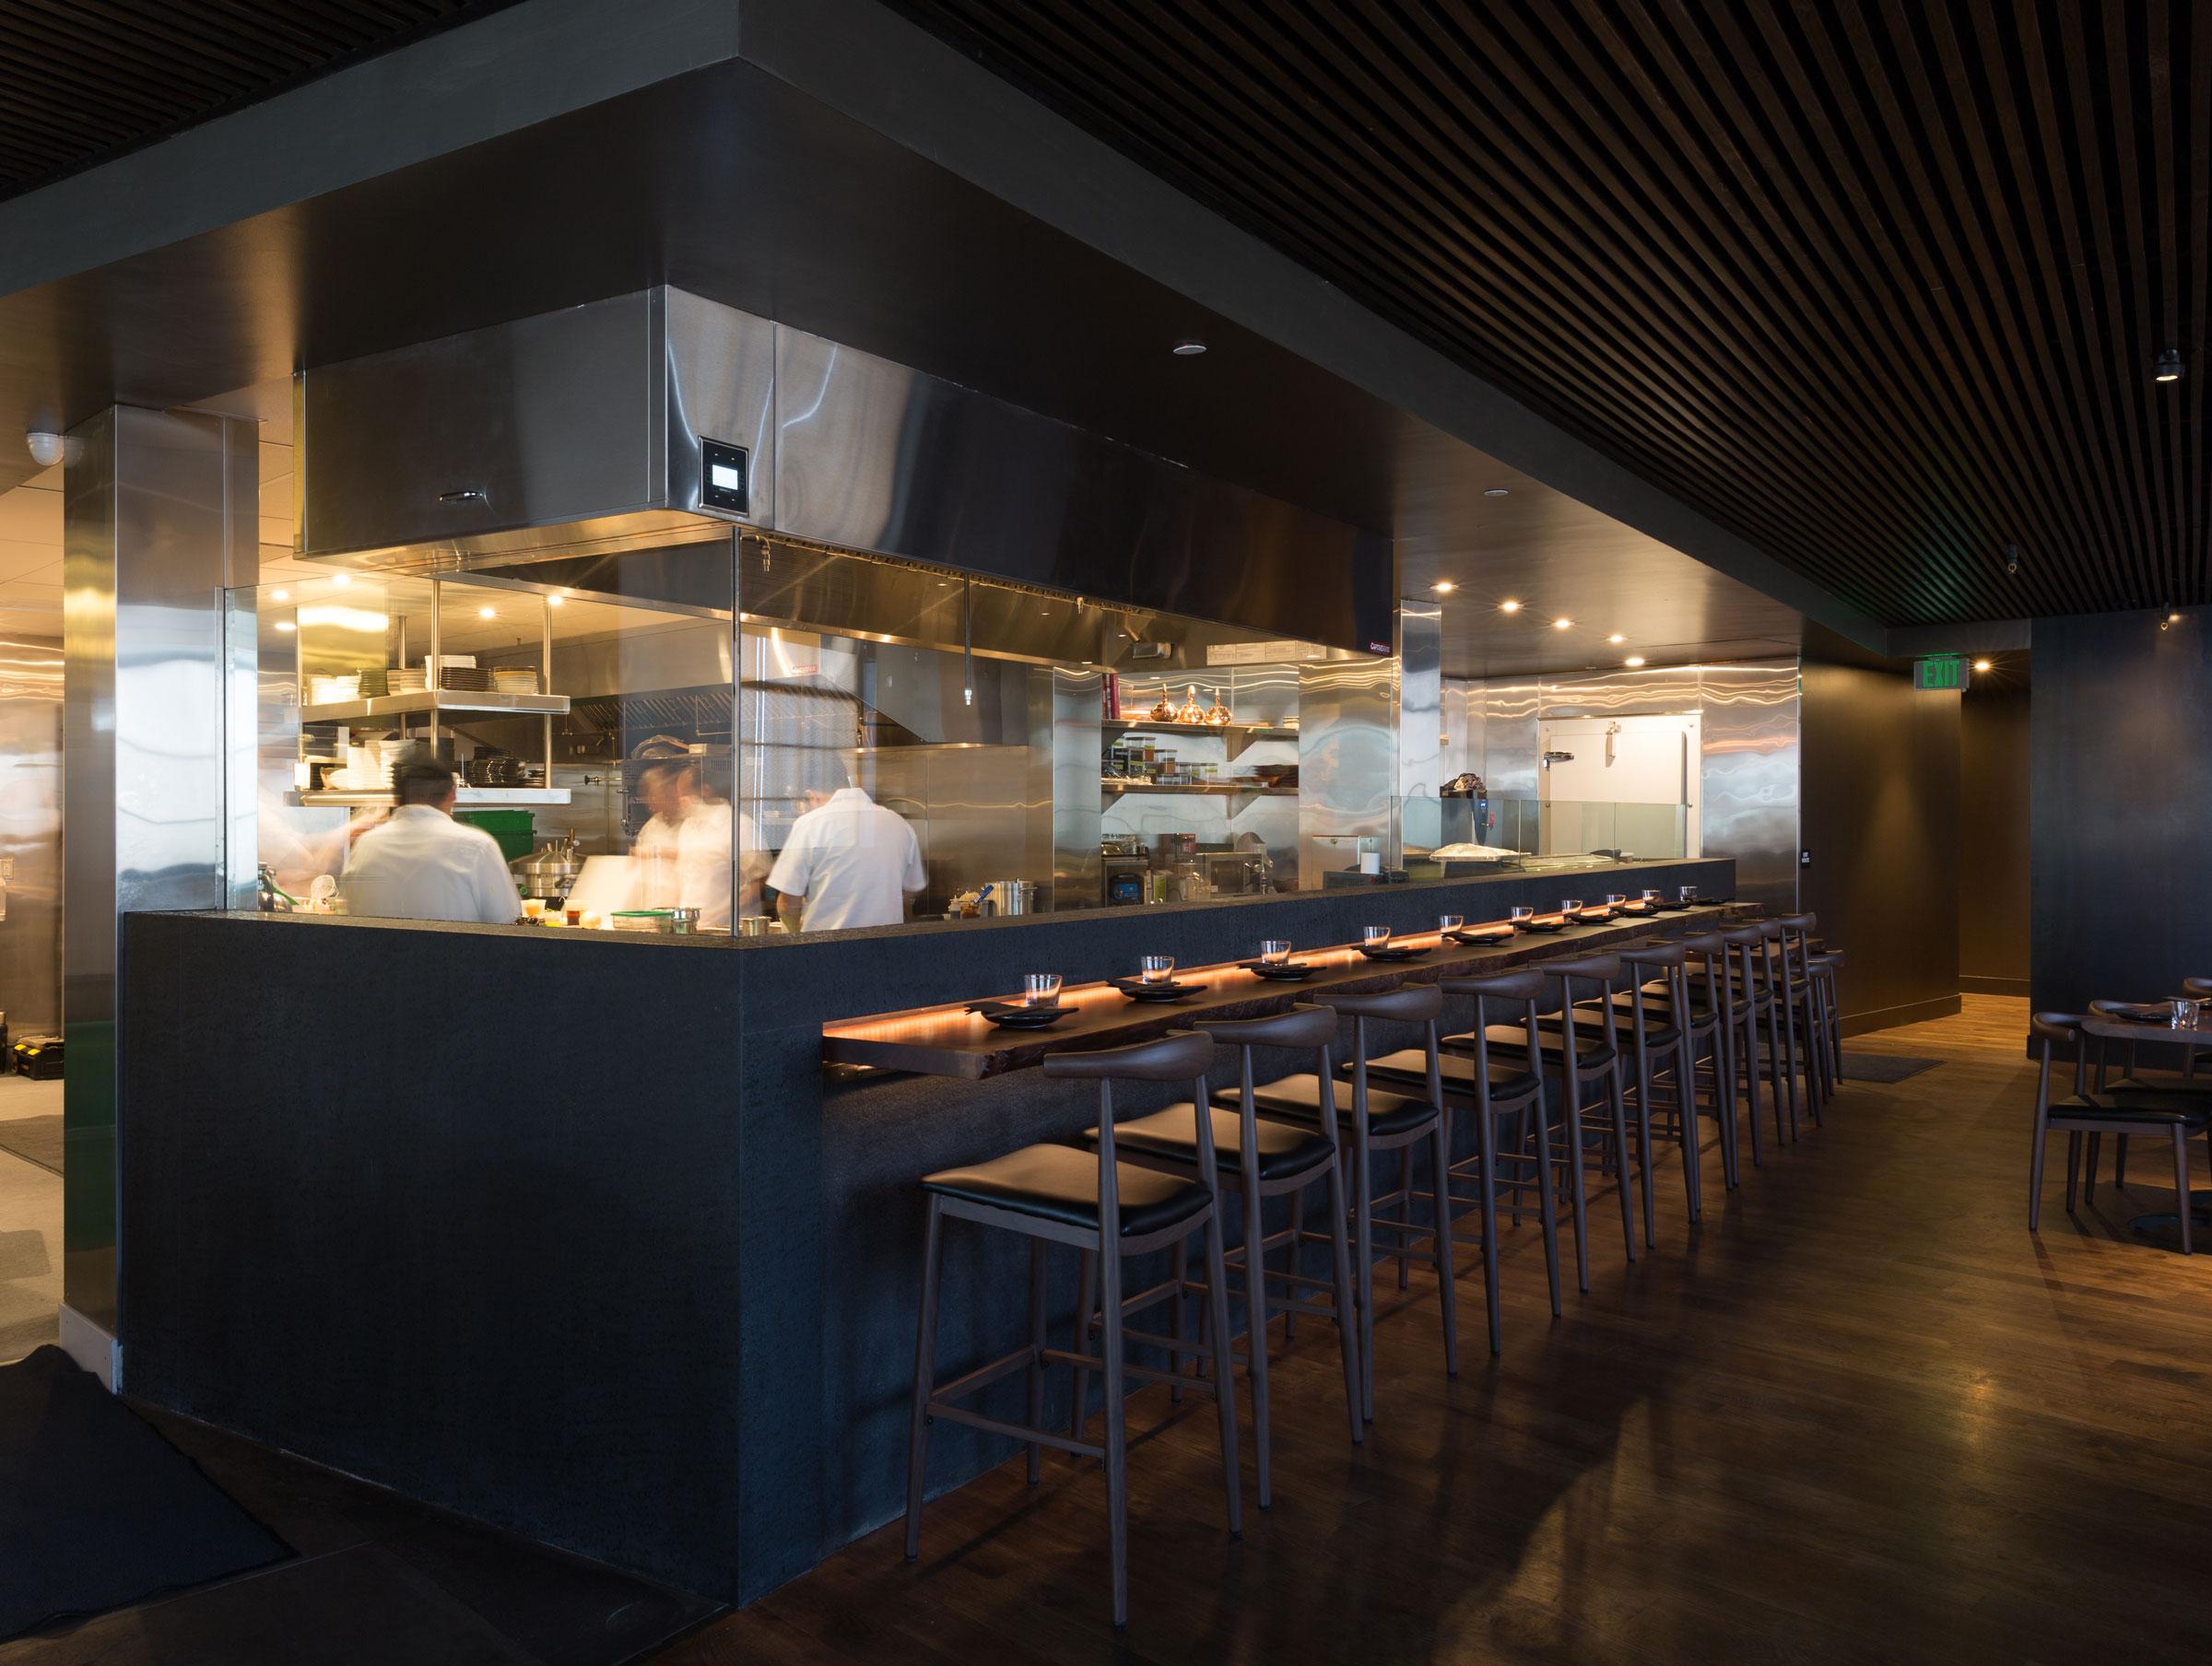 Shinmai Restaurant Kitchen Buestad Construction